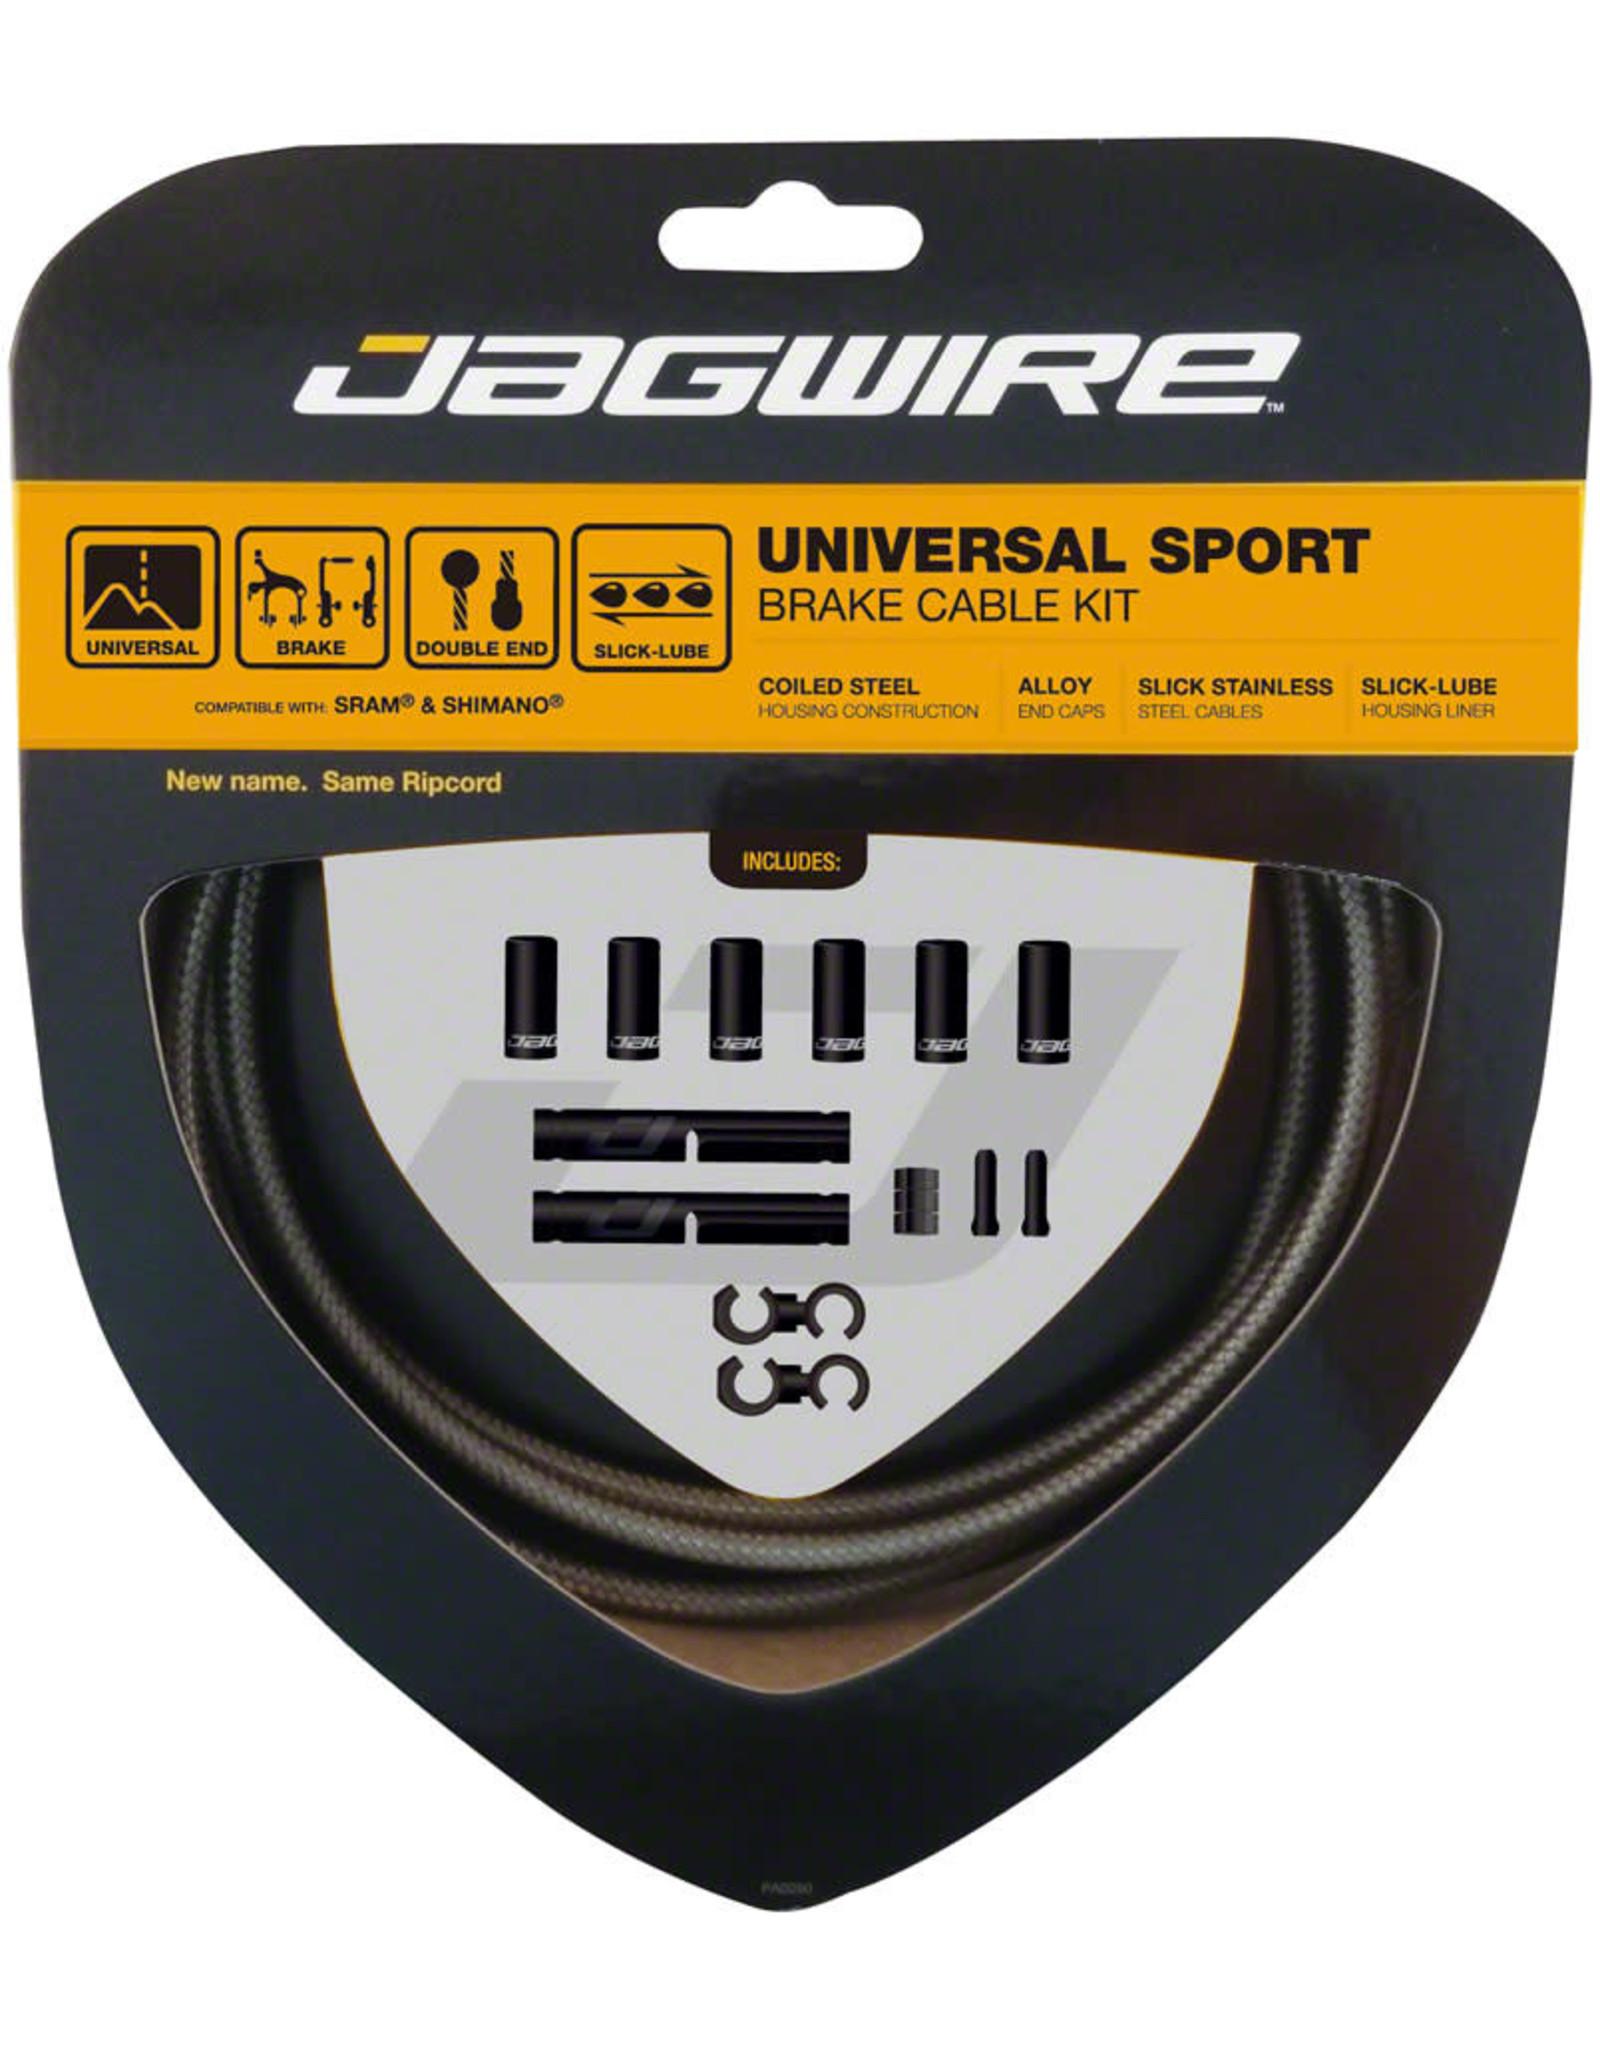 Jagwire Jagwire Universal Sport Brake Cable Kit, Sterling Silver